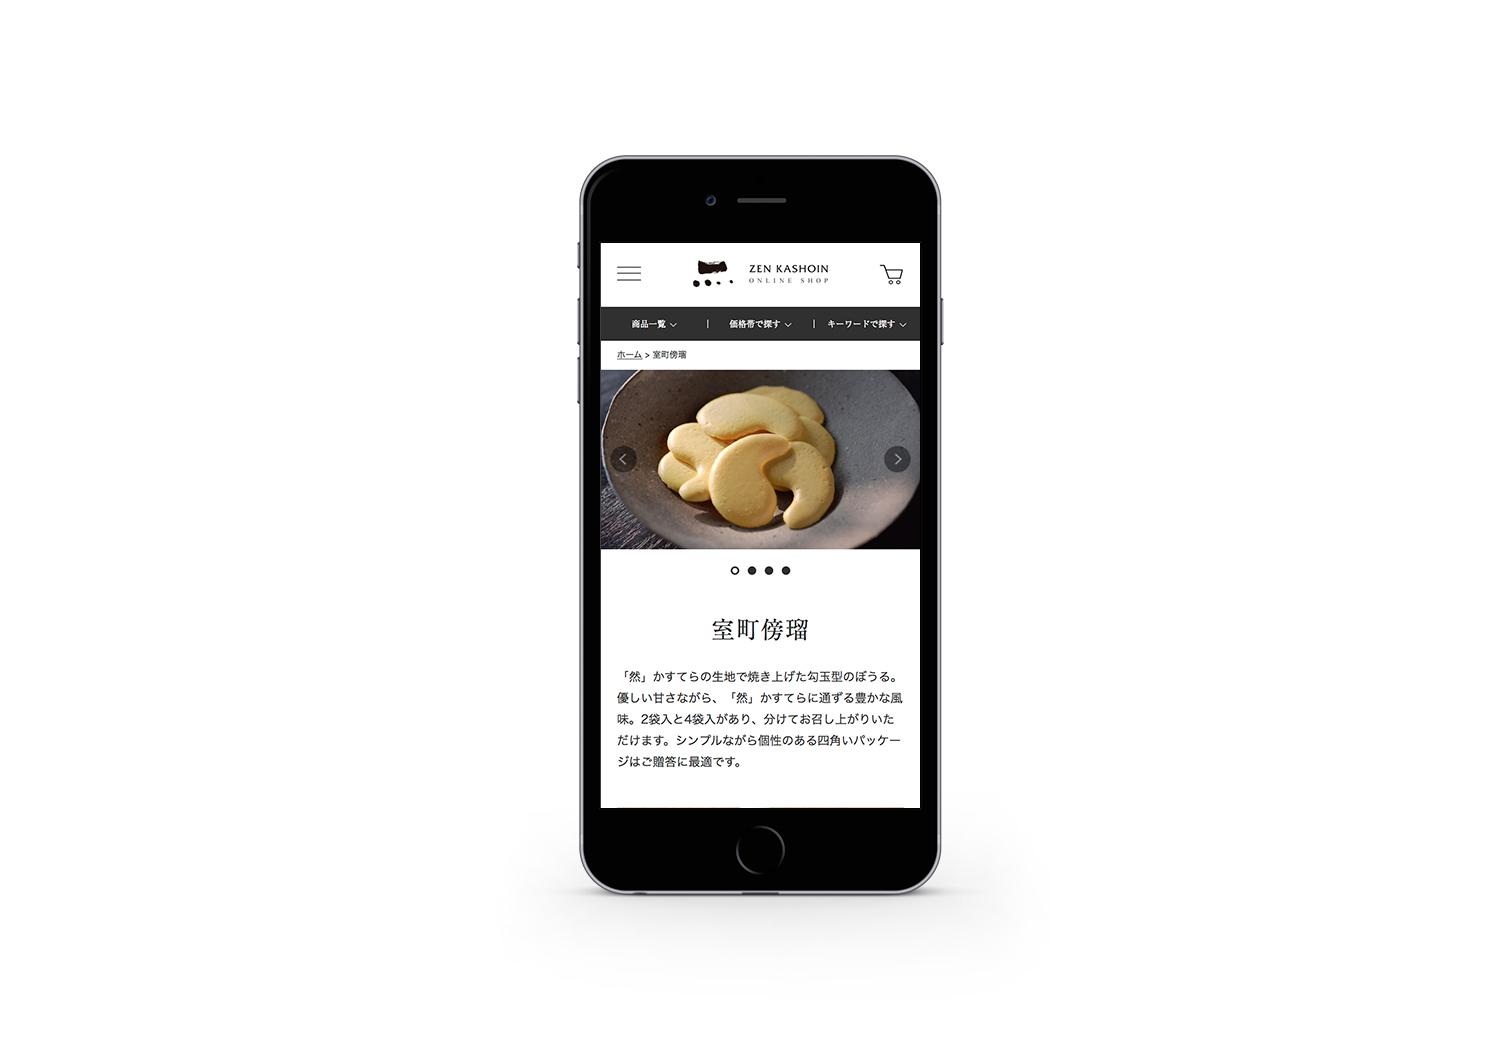 ZEN KASHOIN Official Smartphone Online Shop 2018